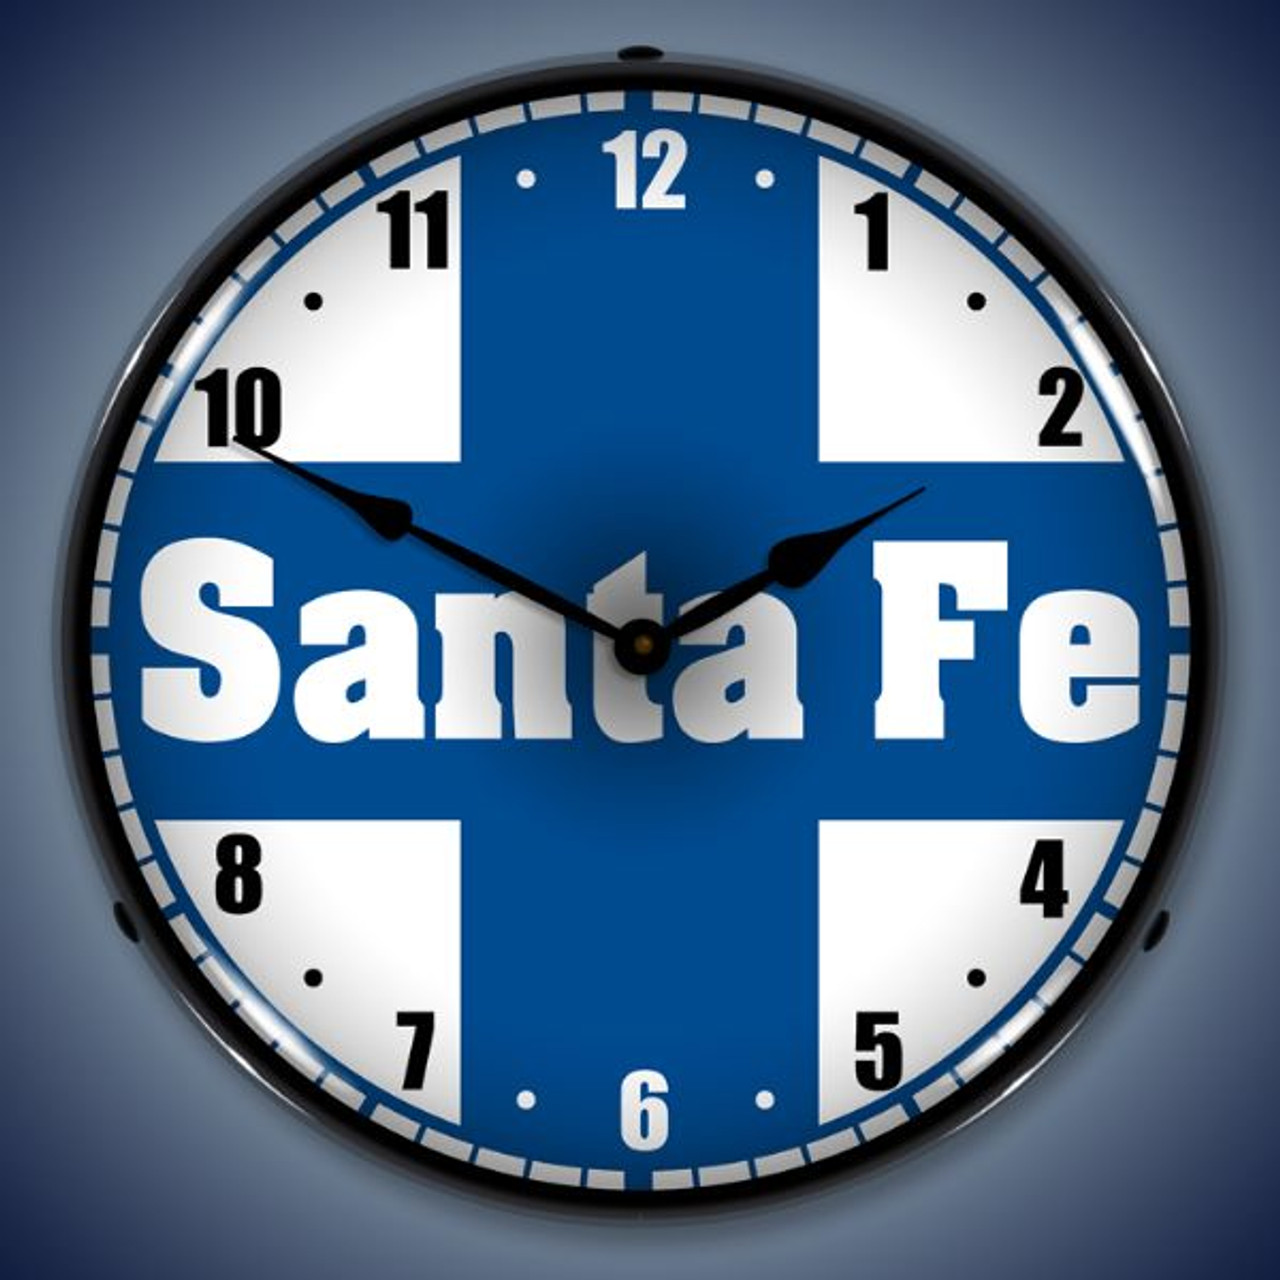 Retro  Santa Fe Railroad Lighted Wall Clock 14 x 14 Inches